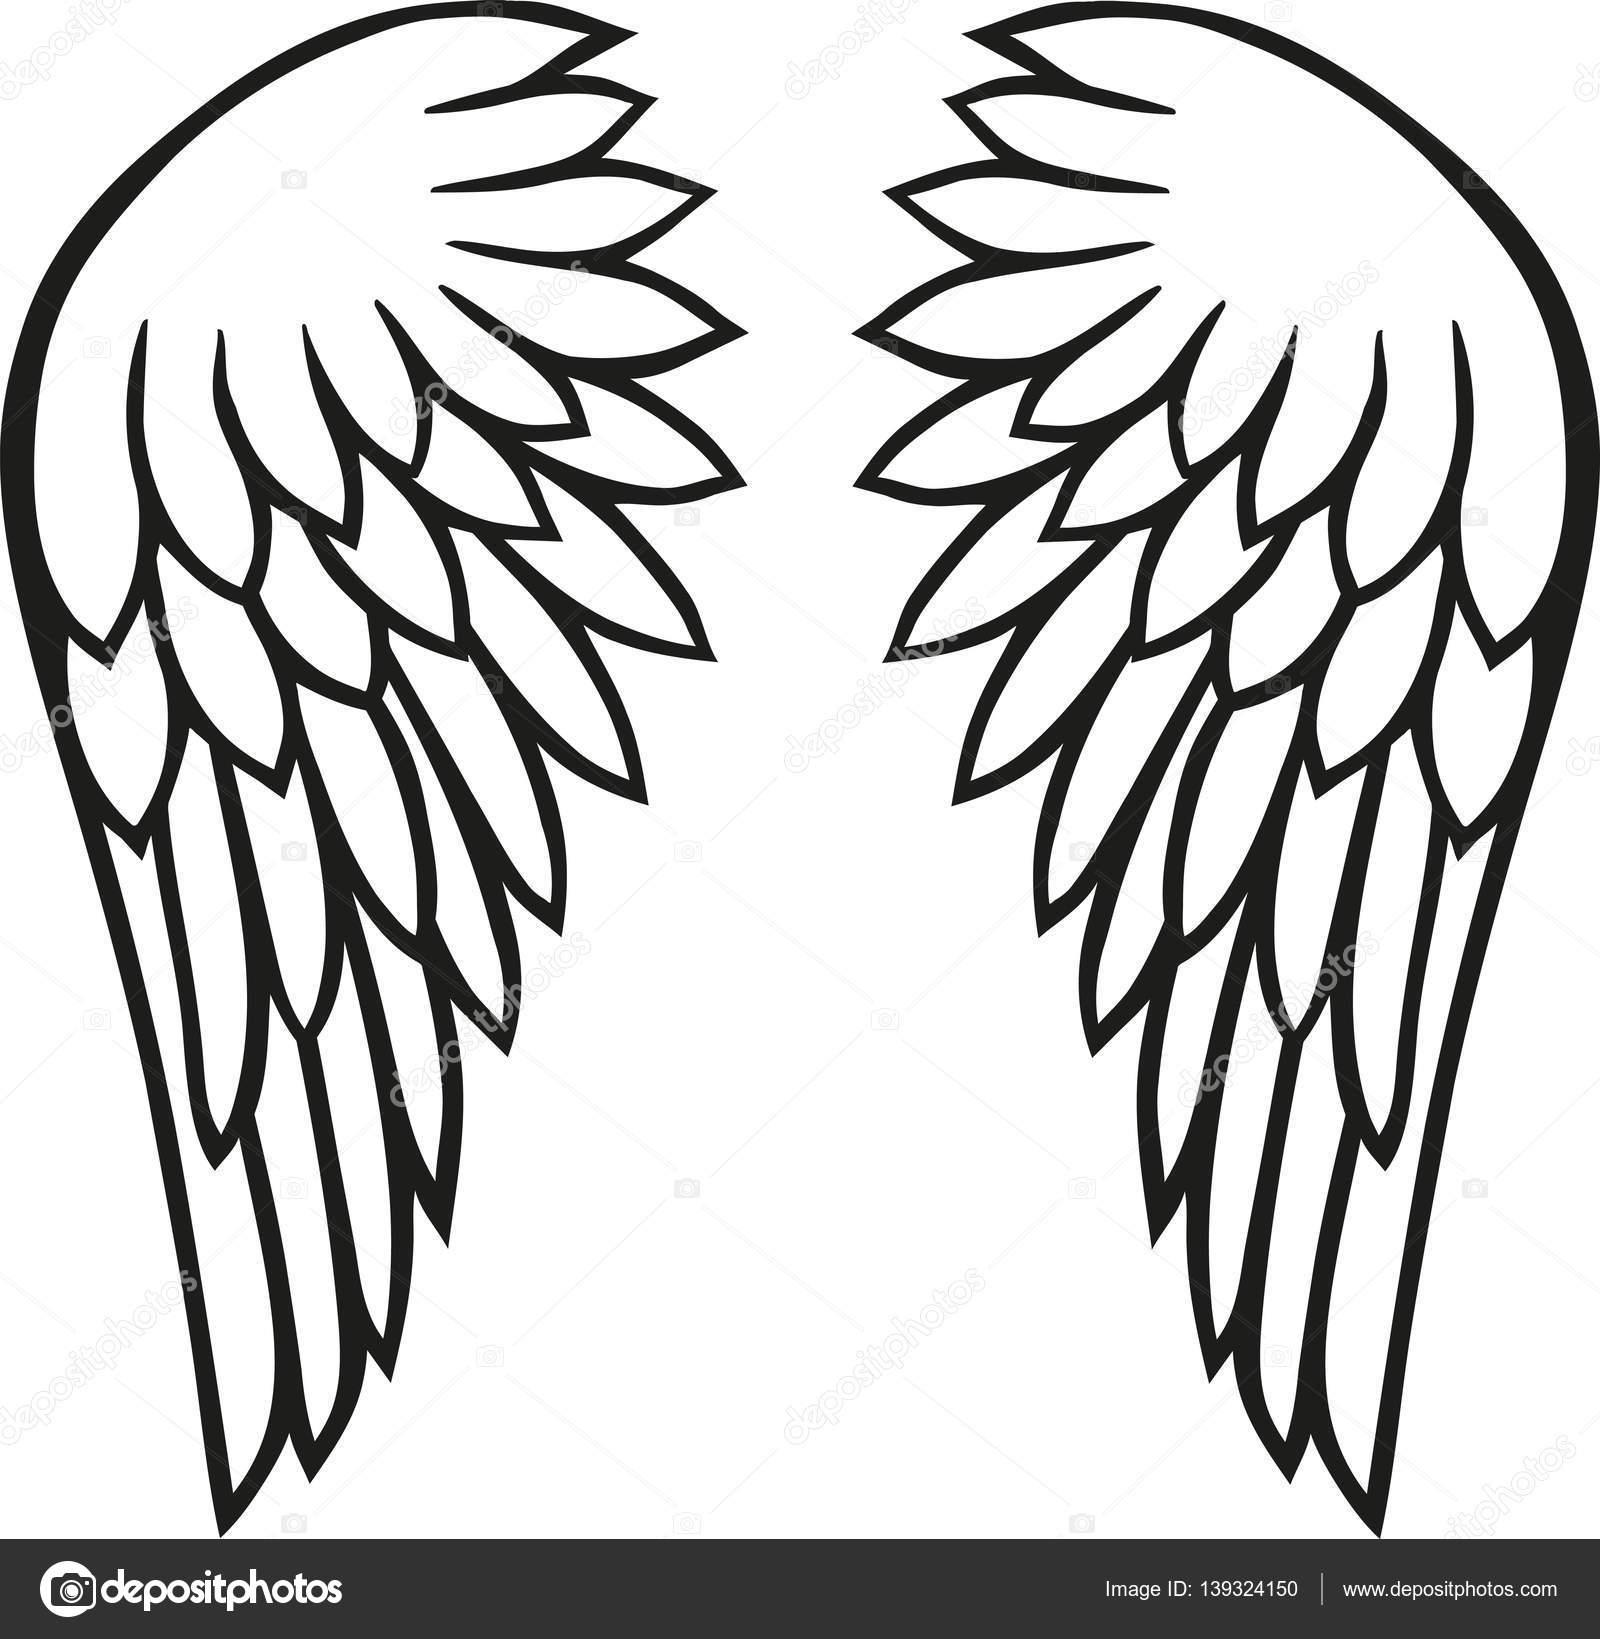 angel wings vector stock vector miceking 139324150 rh depositphotos com angel wings vector png angel wings vector free